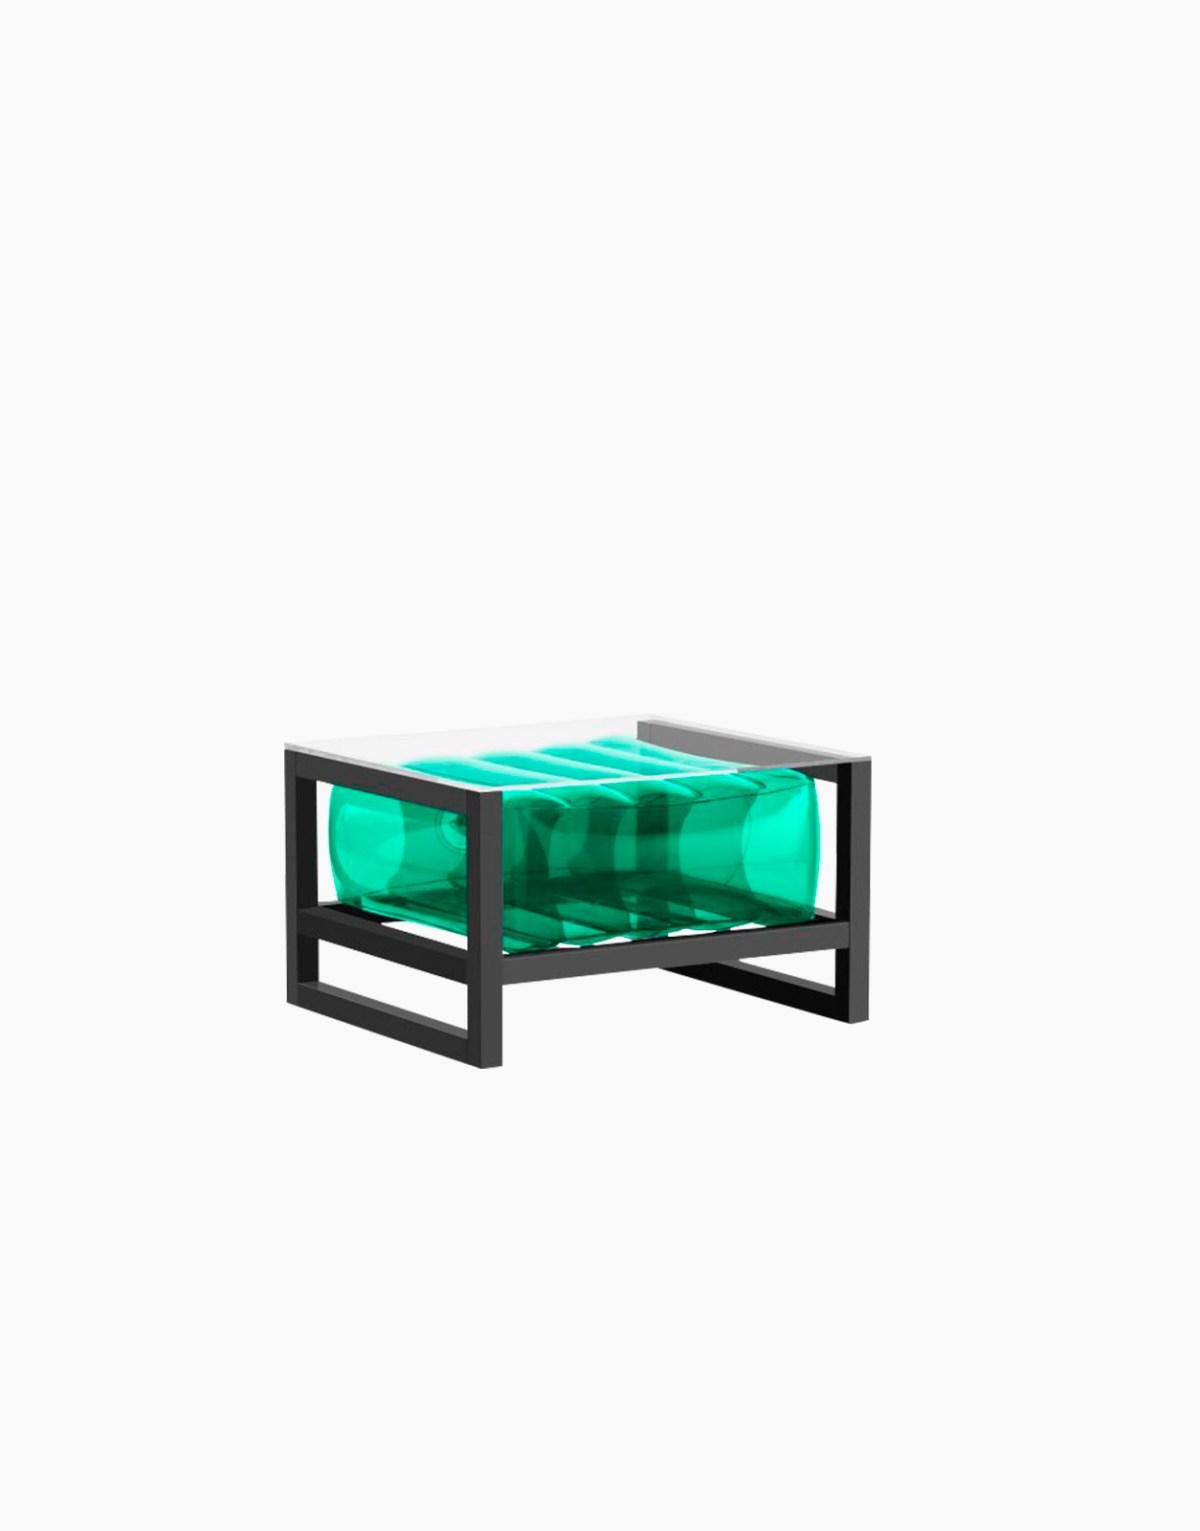 Revendeur de Mojow solution design fr mobilier table basse Yoko vert cristal